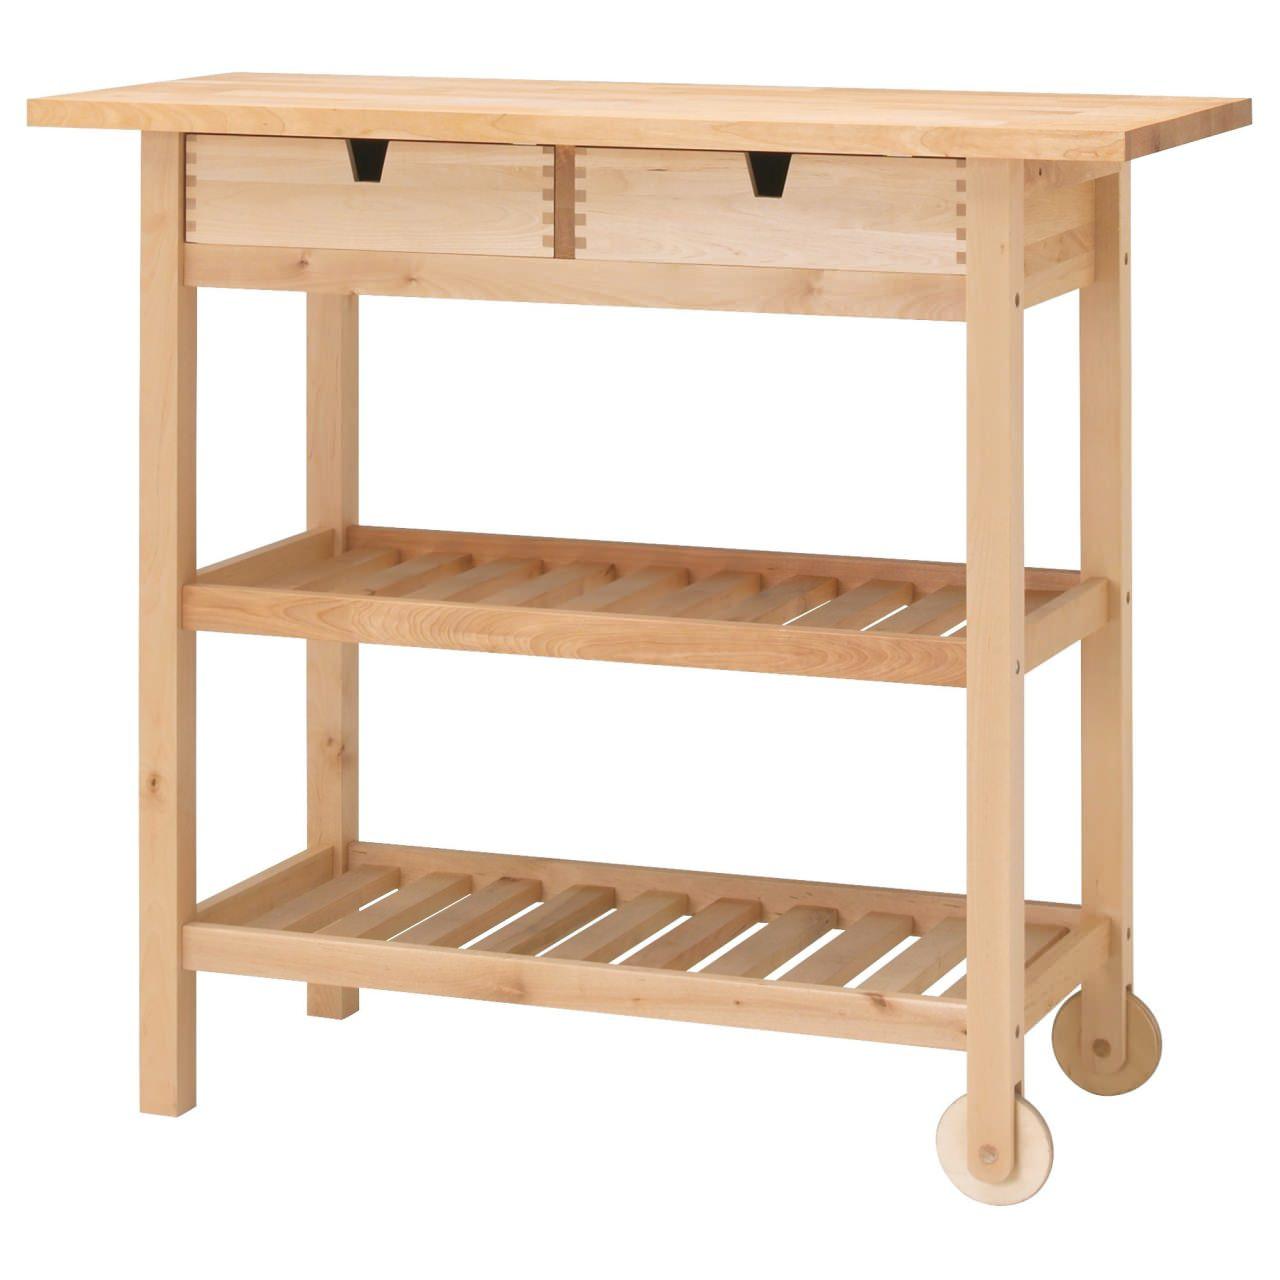 Ikea Beistelltisch Küche  Ikea Beistelltisch Küche Küchen Beistelltisch Ikea